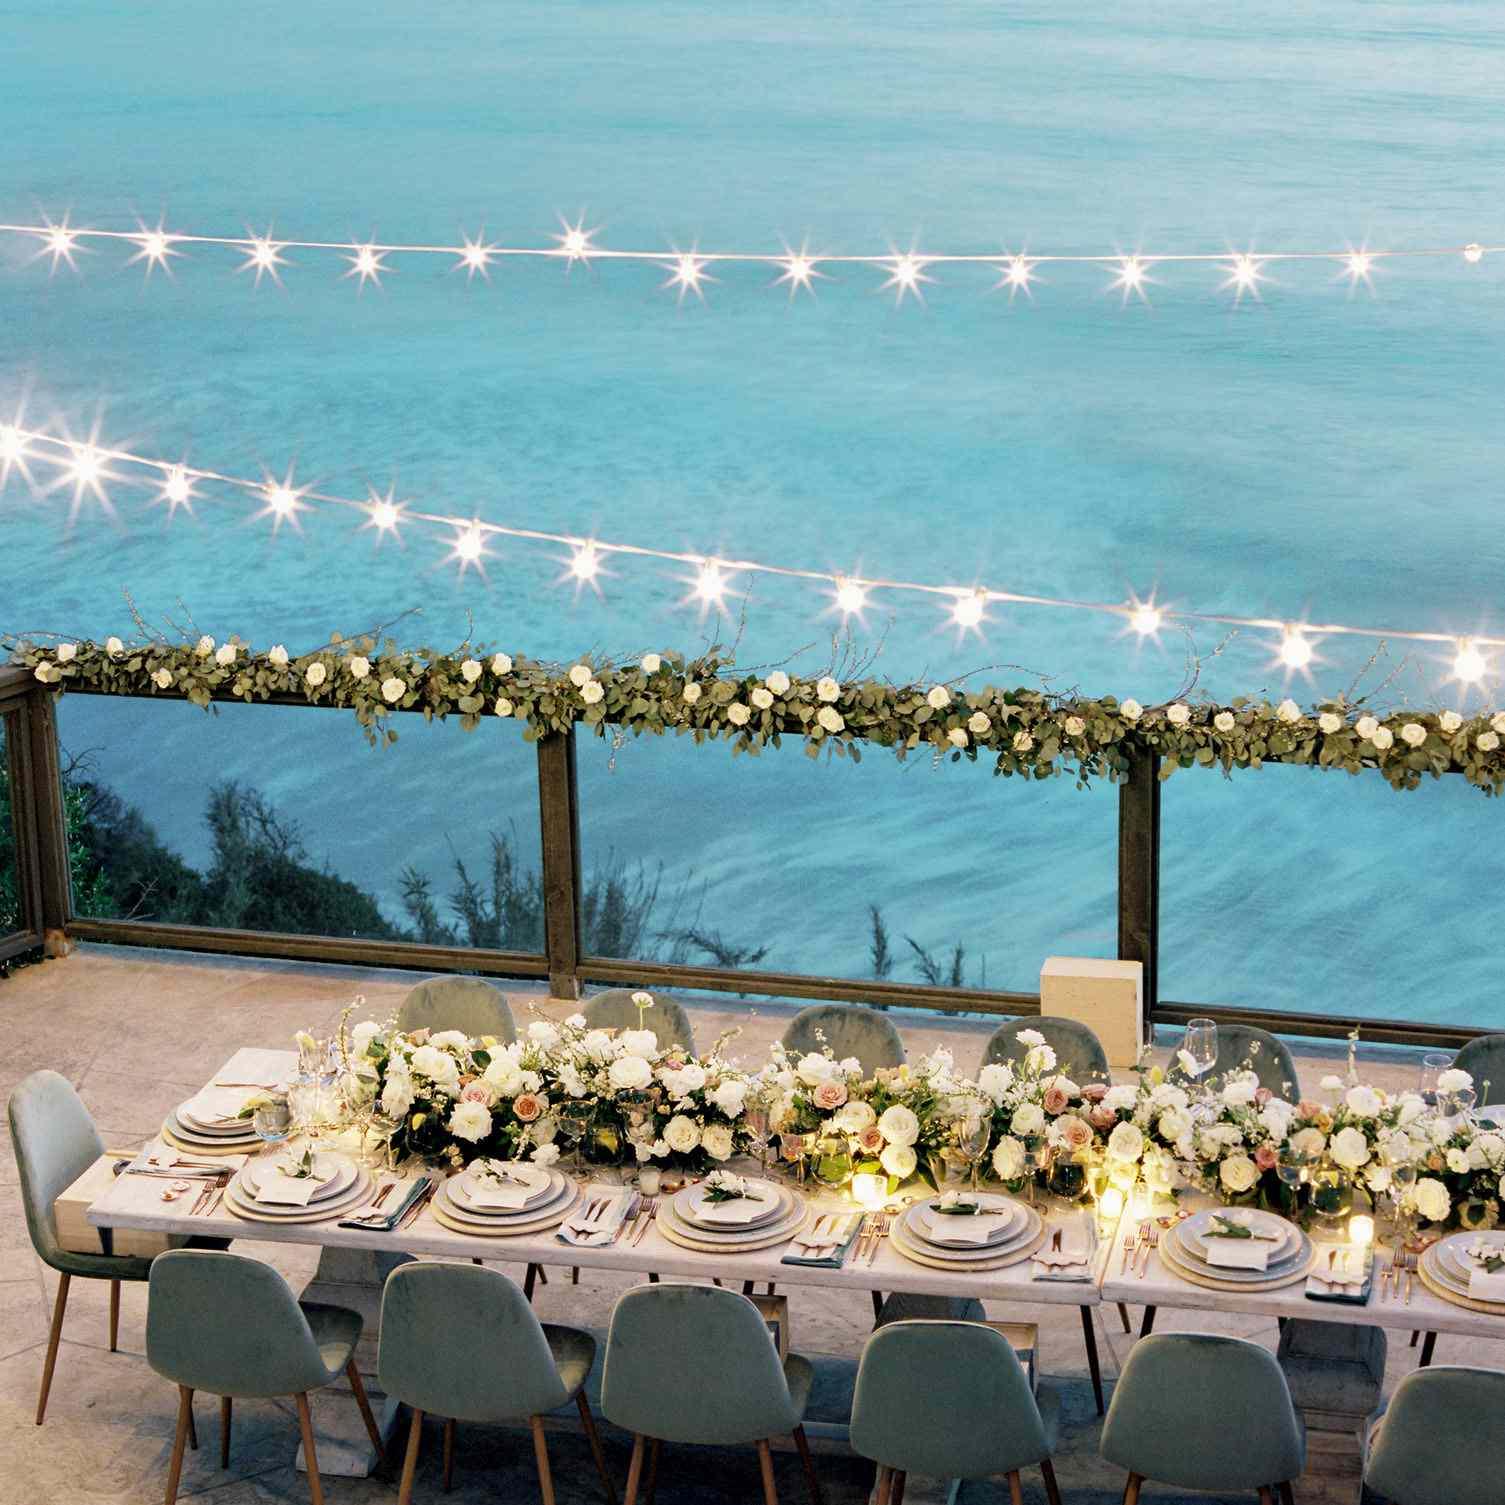 Ocea-side dinner with string lights